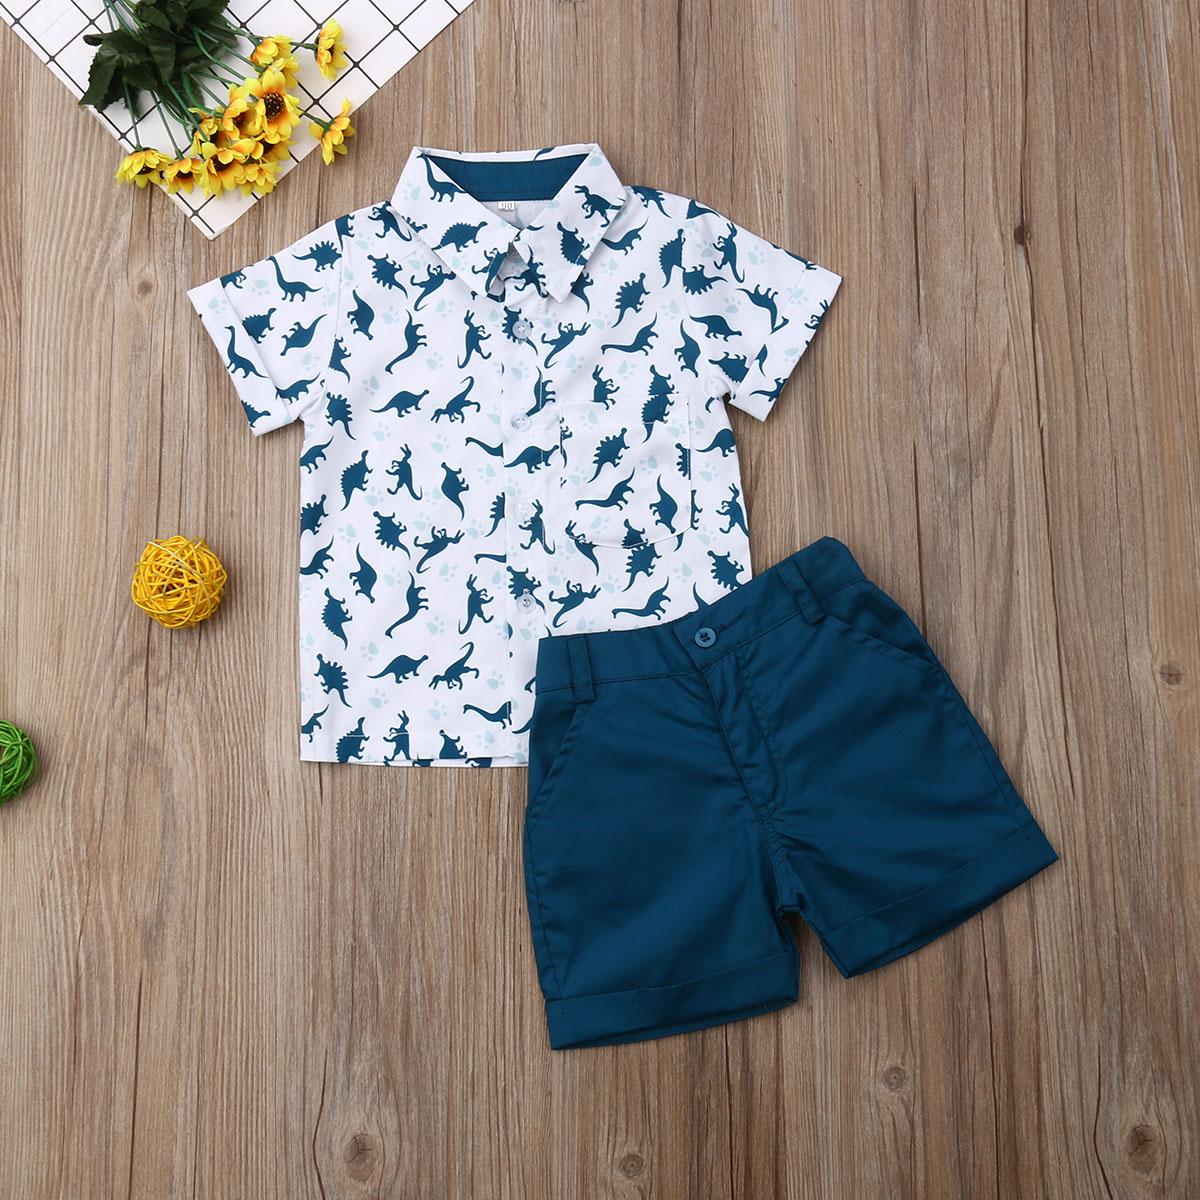 Emmababy Summer Toddler Baby Boy Clothes Dinosaur Print Shirt Tops Short Pants 2Pcs Outfits Casual Clothes Summer